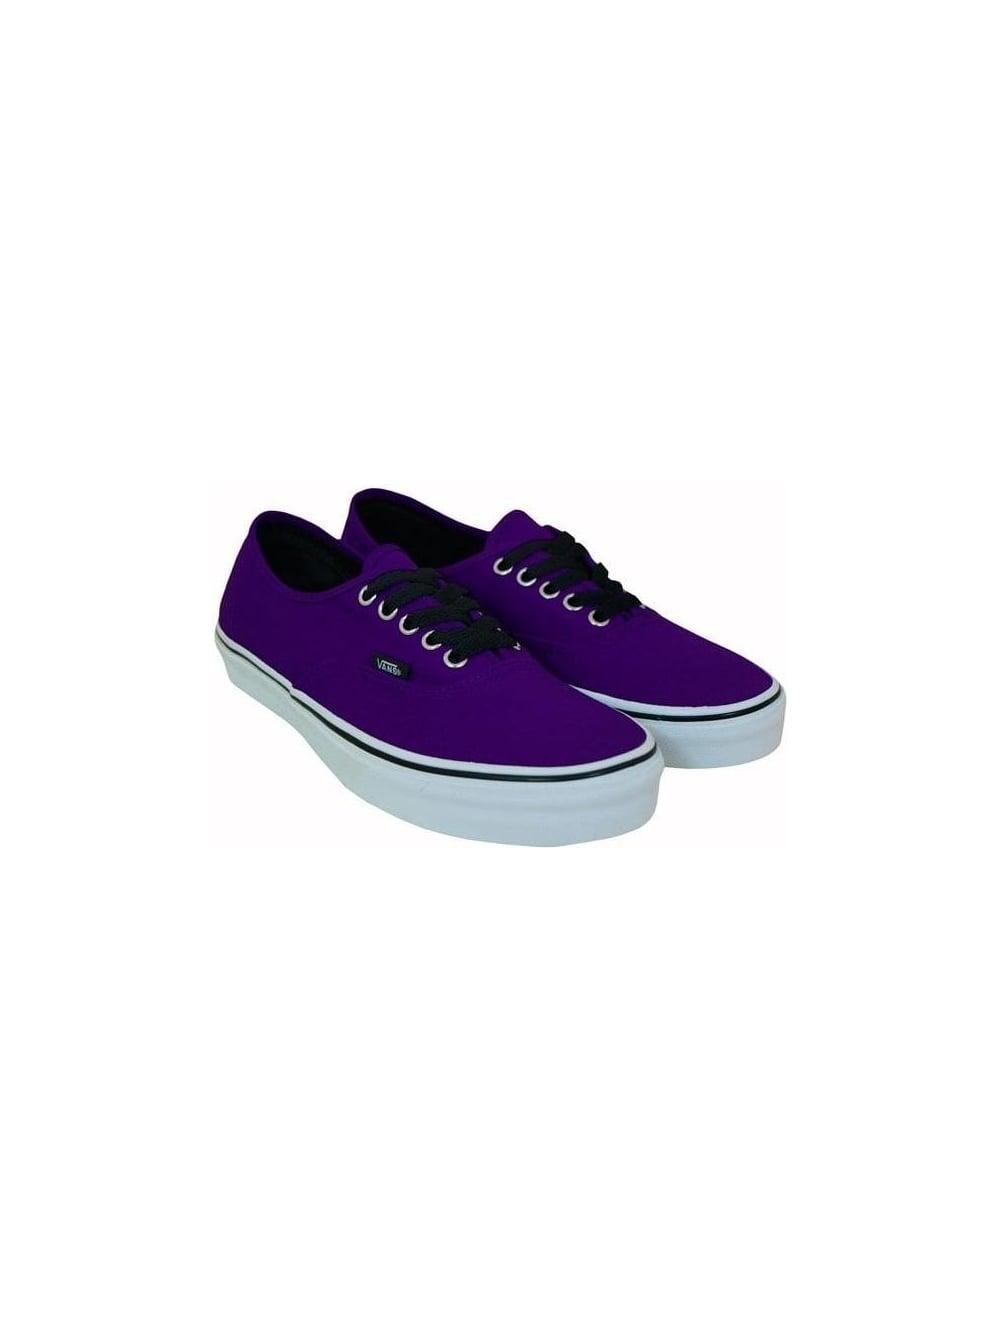 9e08893d9215 Vans Authentic Retro Plimsoll in Dark Purple - Shop Vans at Northern ...